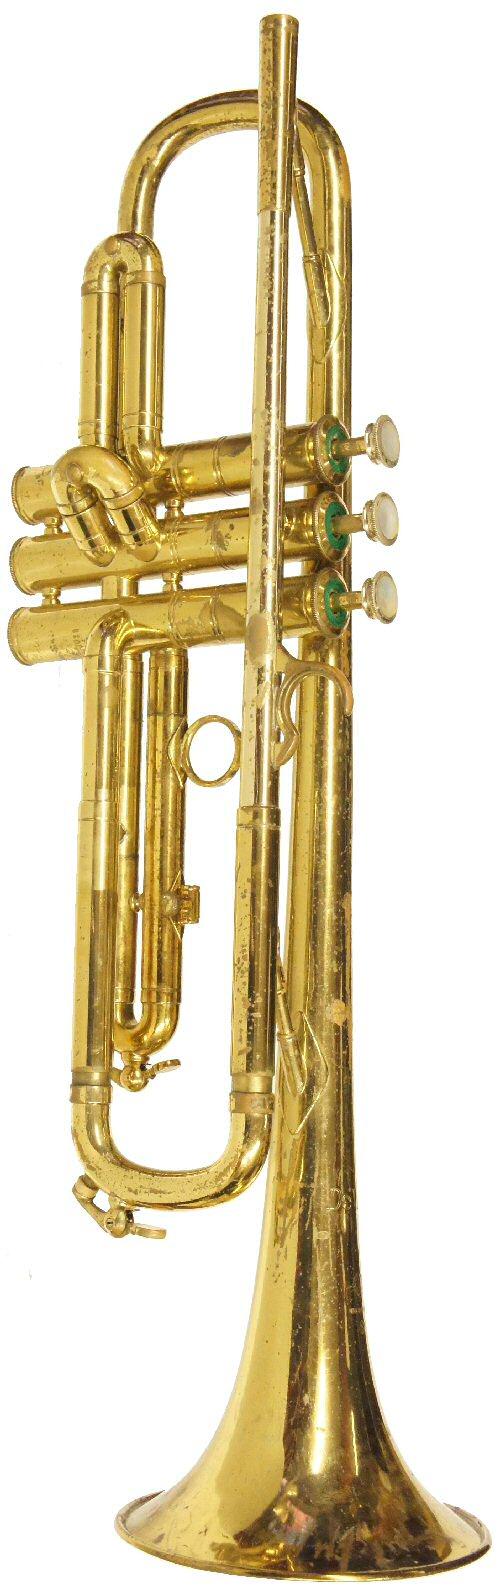 Second Hand Selmer De Ville Trumpet C1963